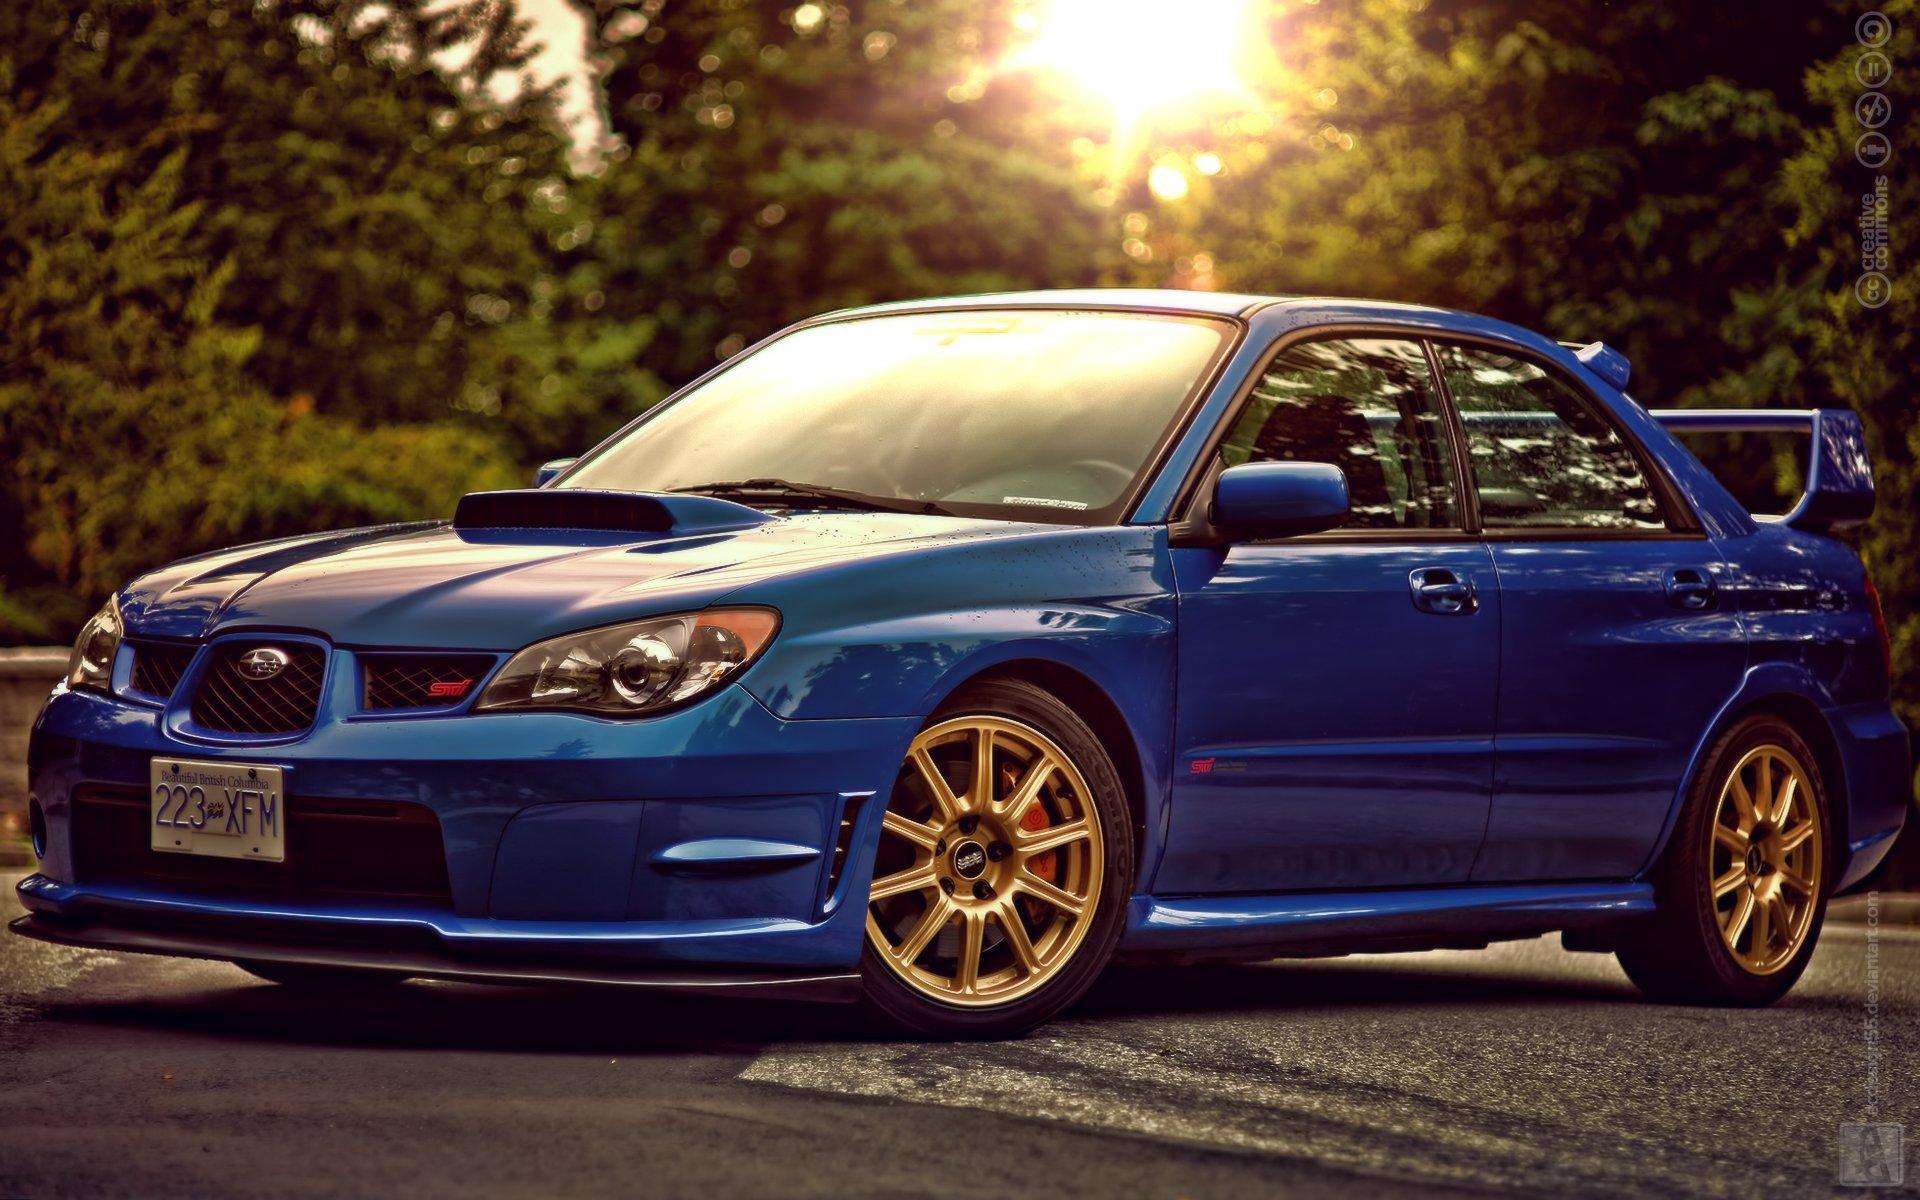 Subaru Wrx Sti Impreza 2017 >> Subaru Impreza WRX Sti Blue wallpaper | 1920x1200 | 747275 | WallpaperUP